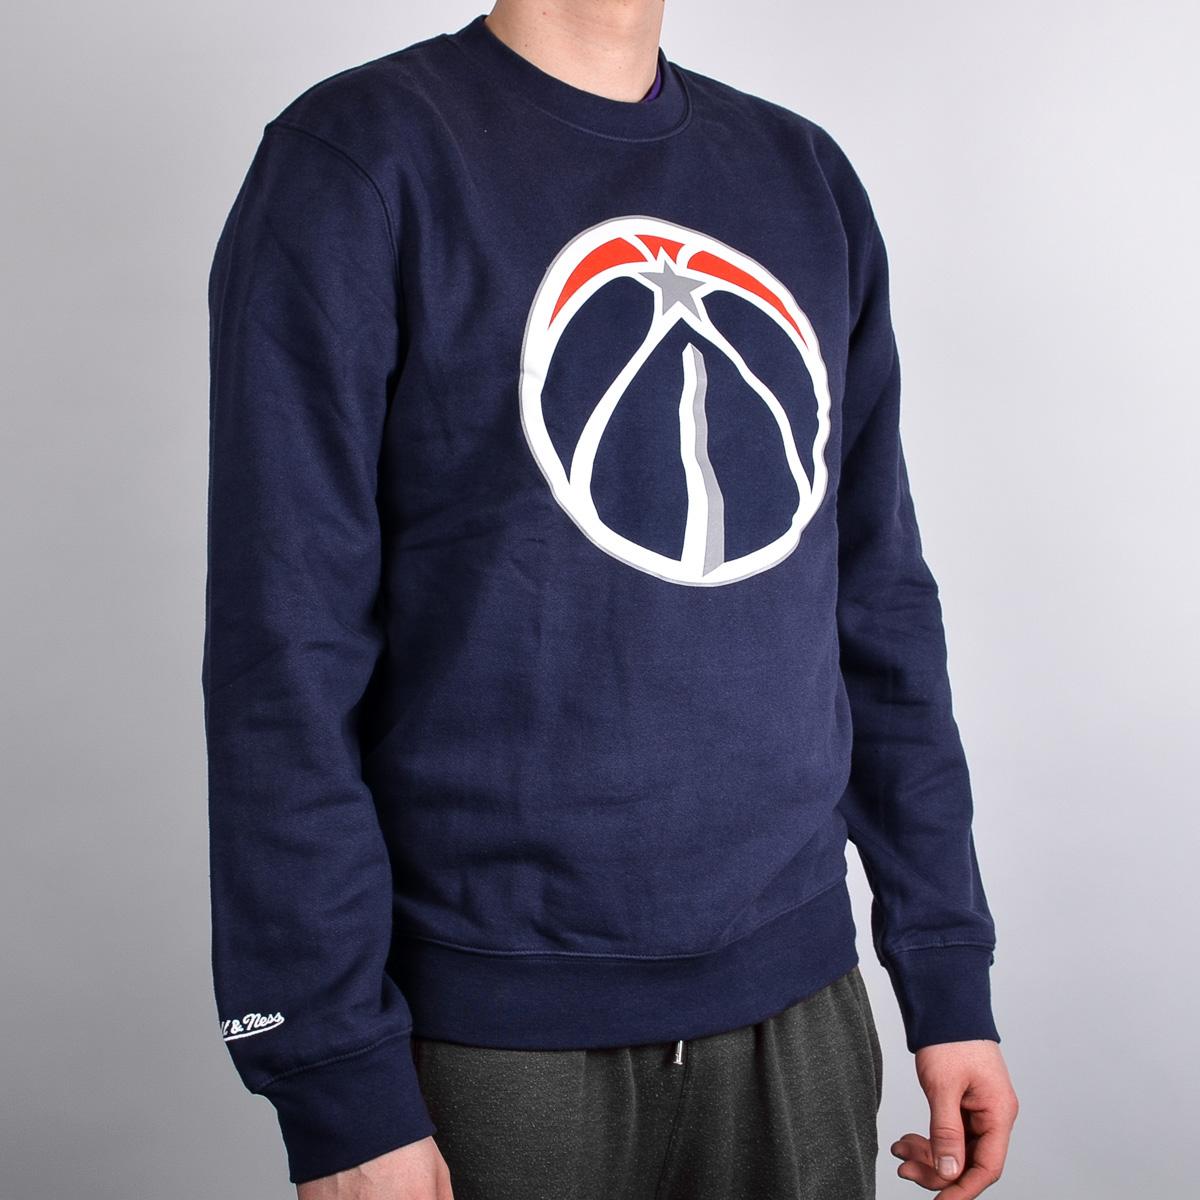 Mitchell   Ness Washington Wizards Team Logo Crewneck - NBA Shop Washington  Wizards Merchandise - Superfanas.lt ae17d91e9